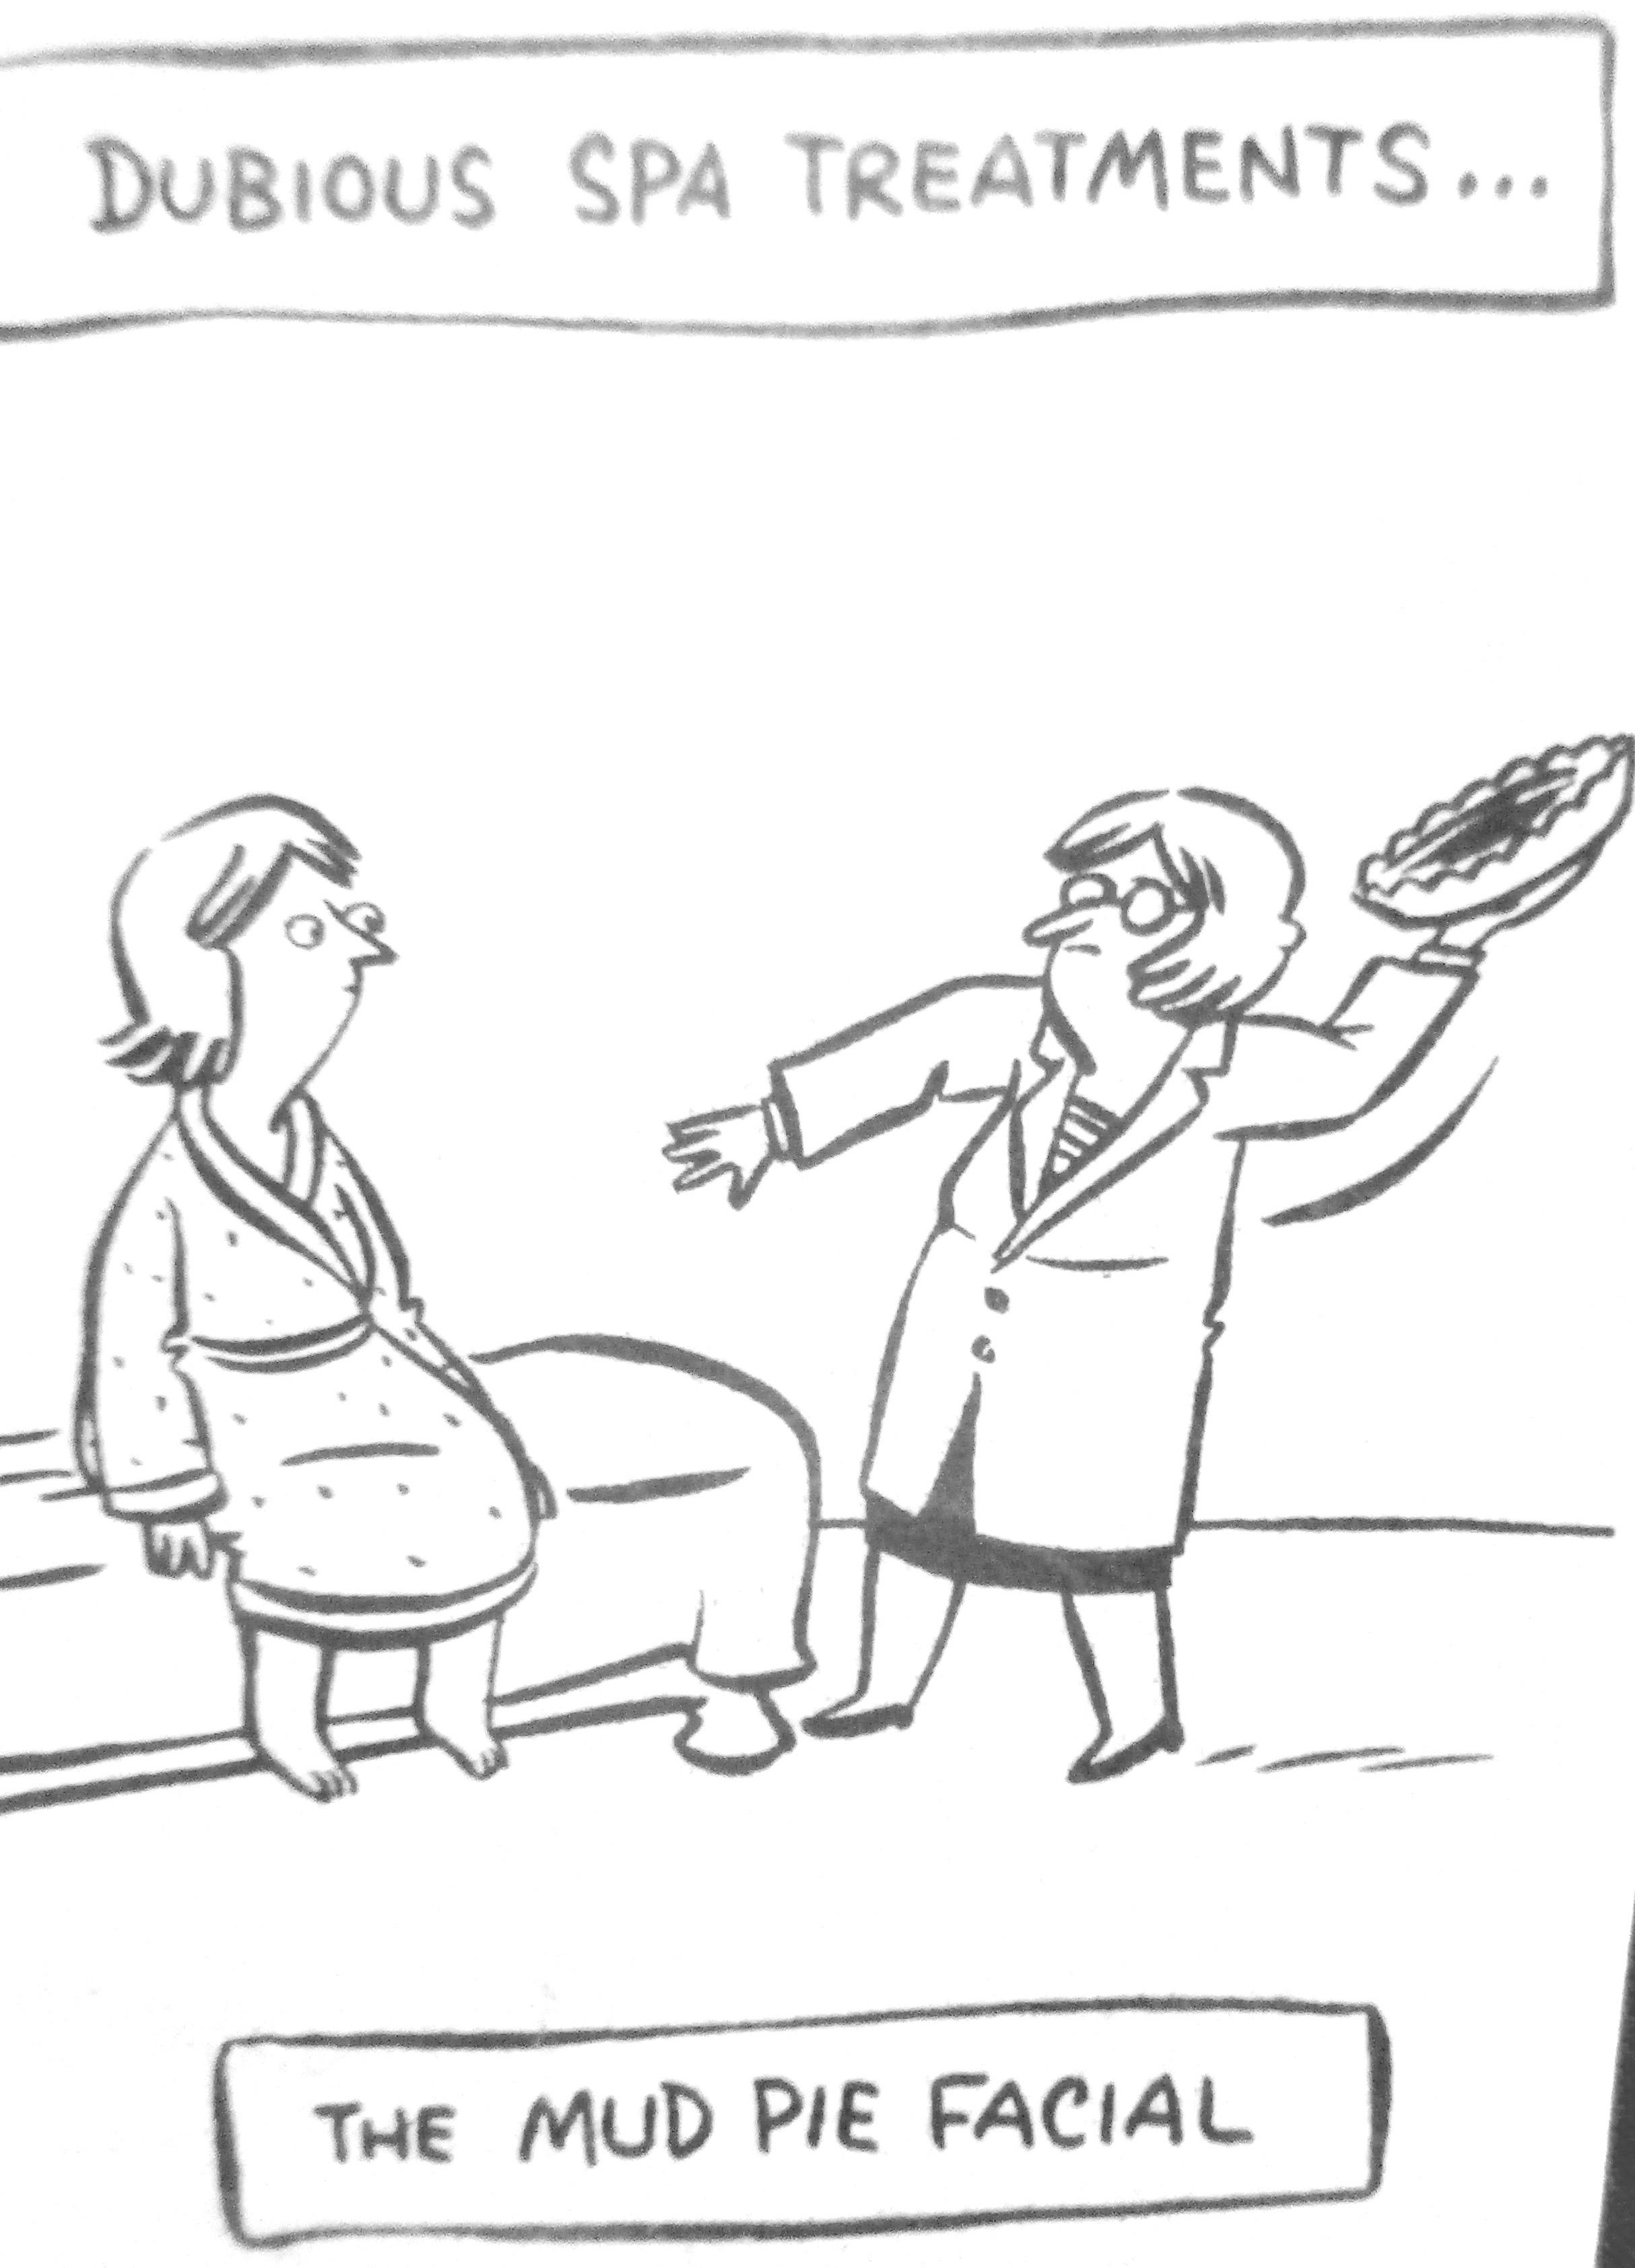 Cartoon Dubious Spa Treatments Antarctica Journal